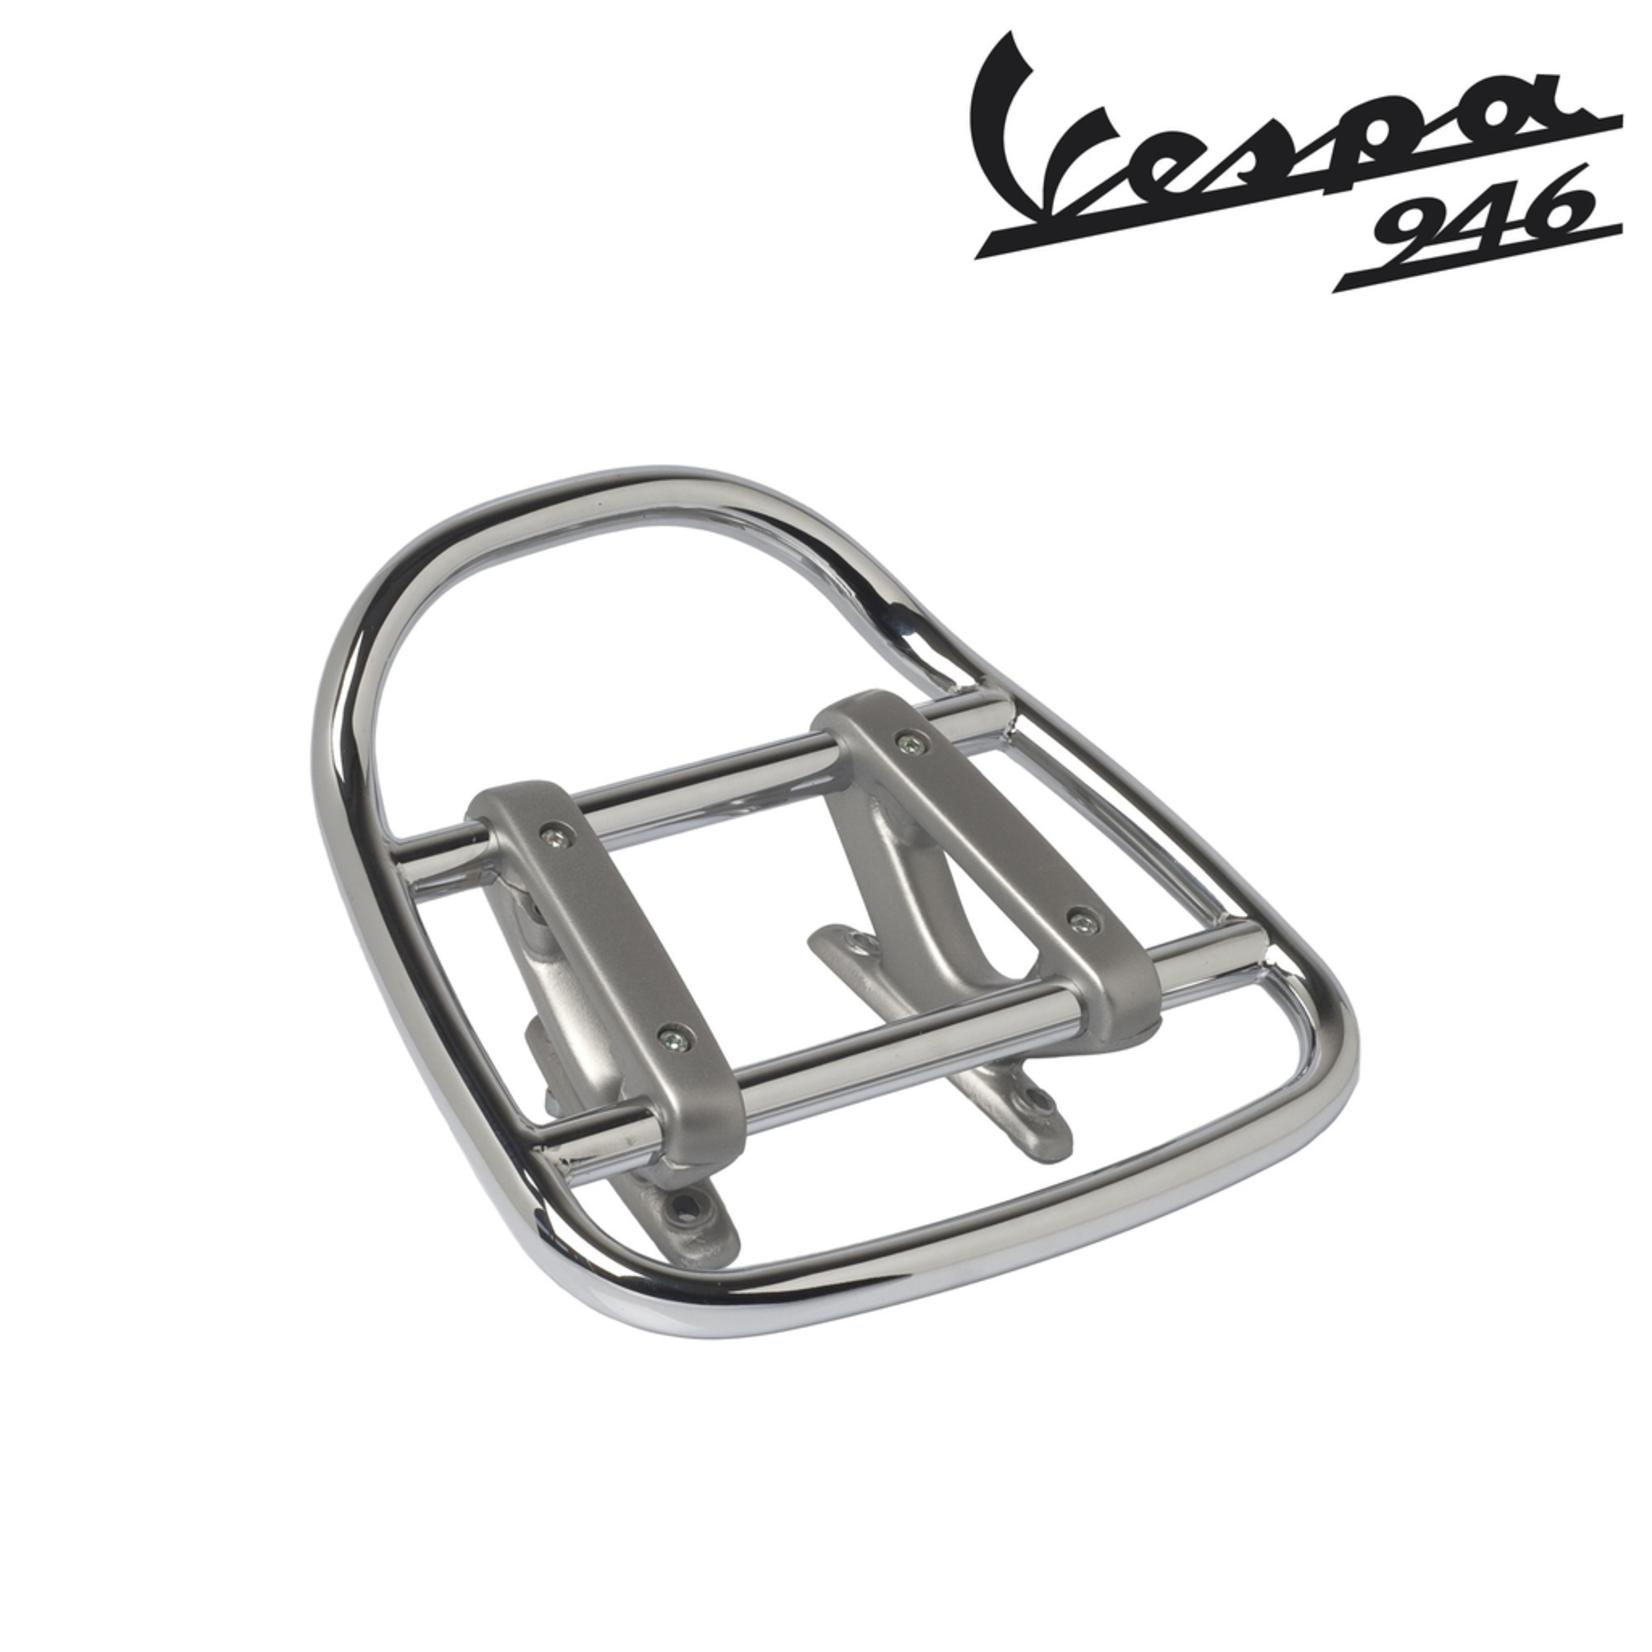 Accessories Rack, Vespa 946 Rear